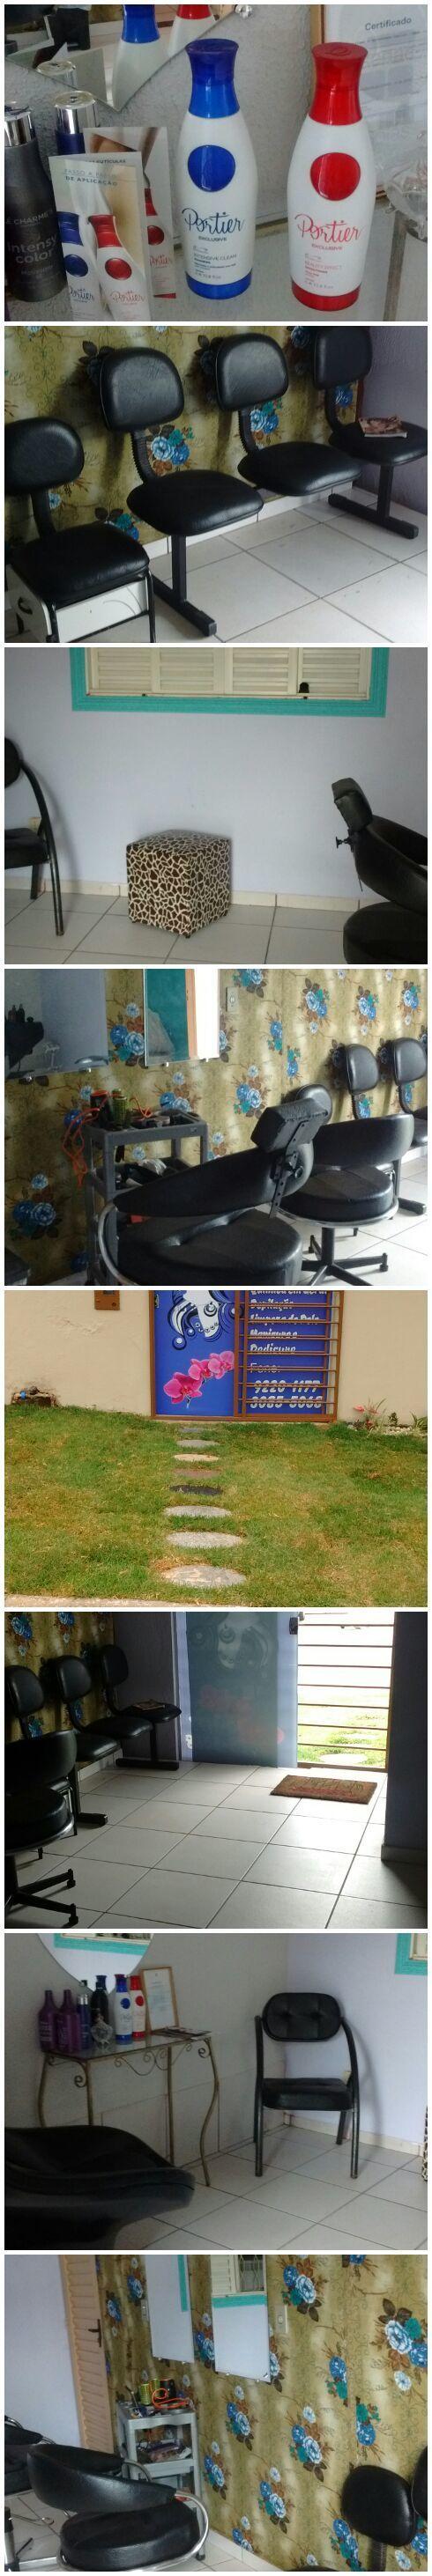 cabeleireiro(a) vendedor(a)